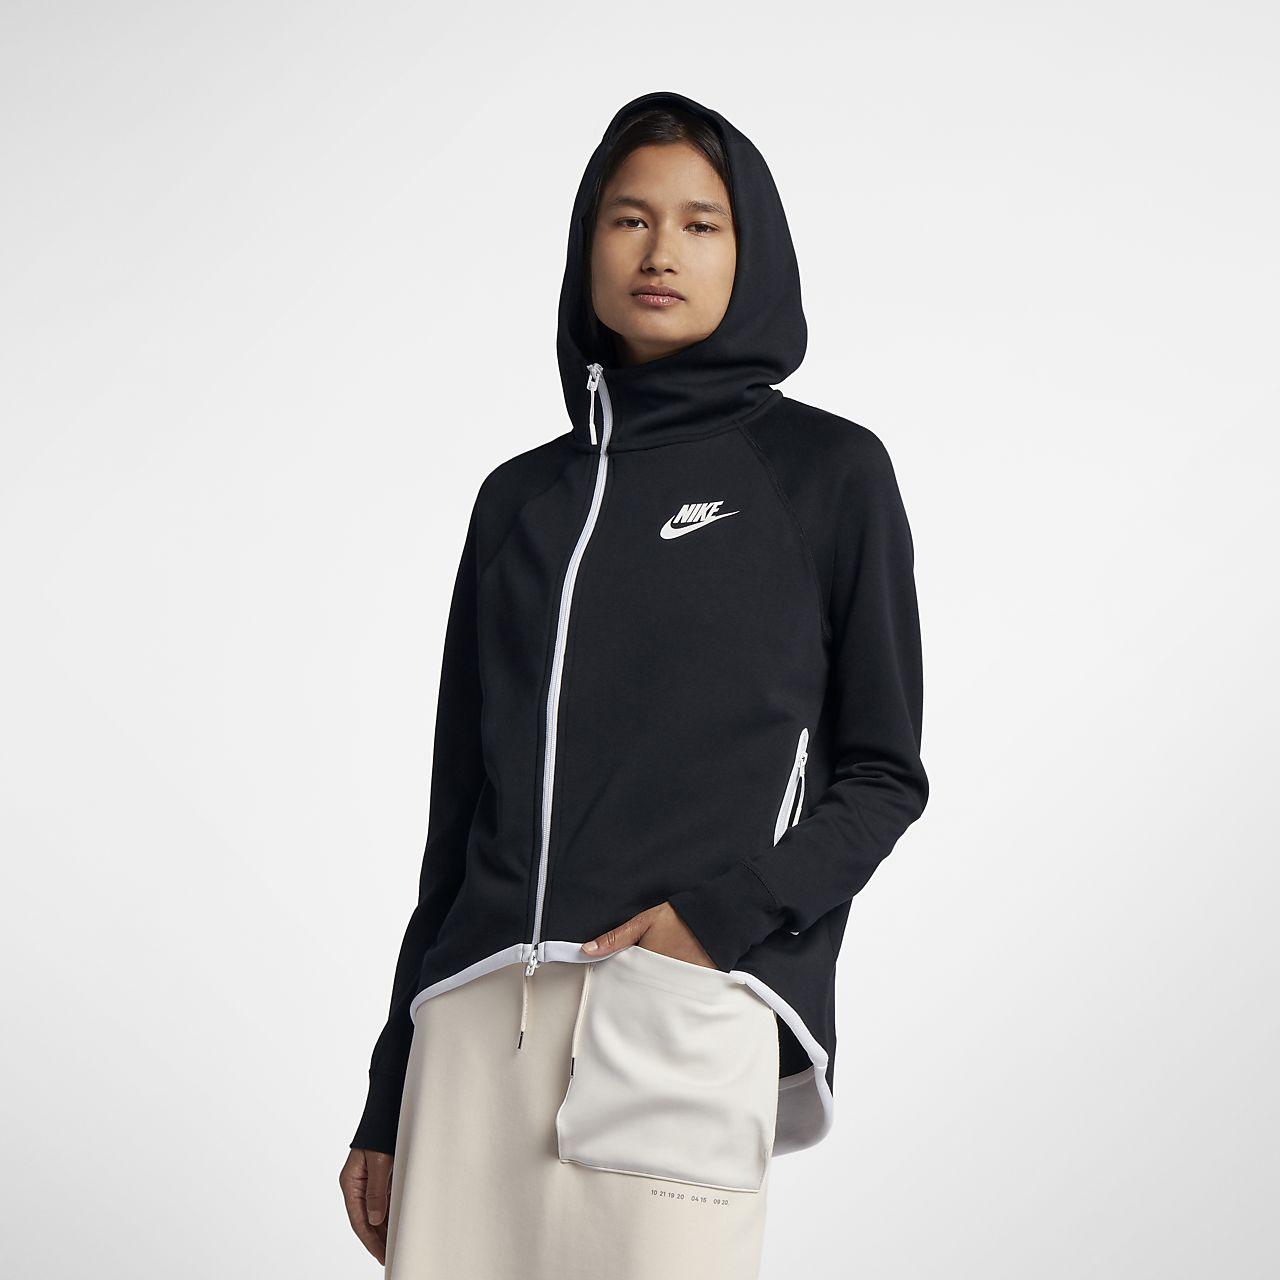 Capa con cierre completo para mujer Nike Sportswear Tech Fleece